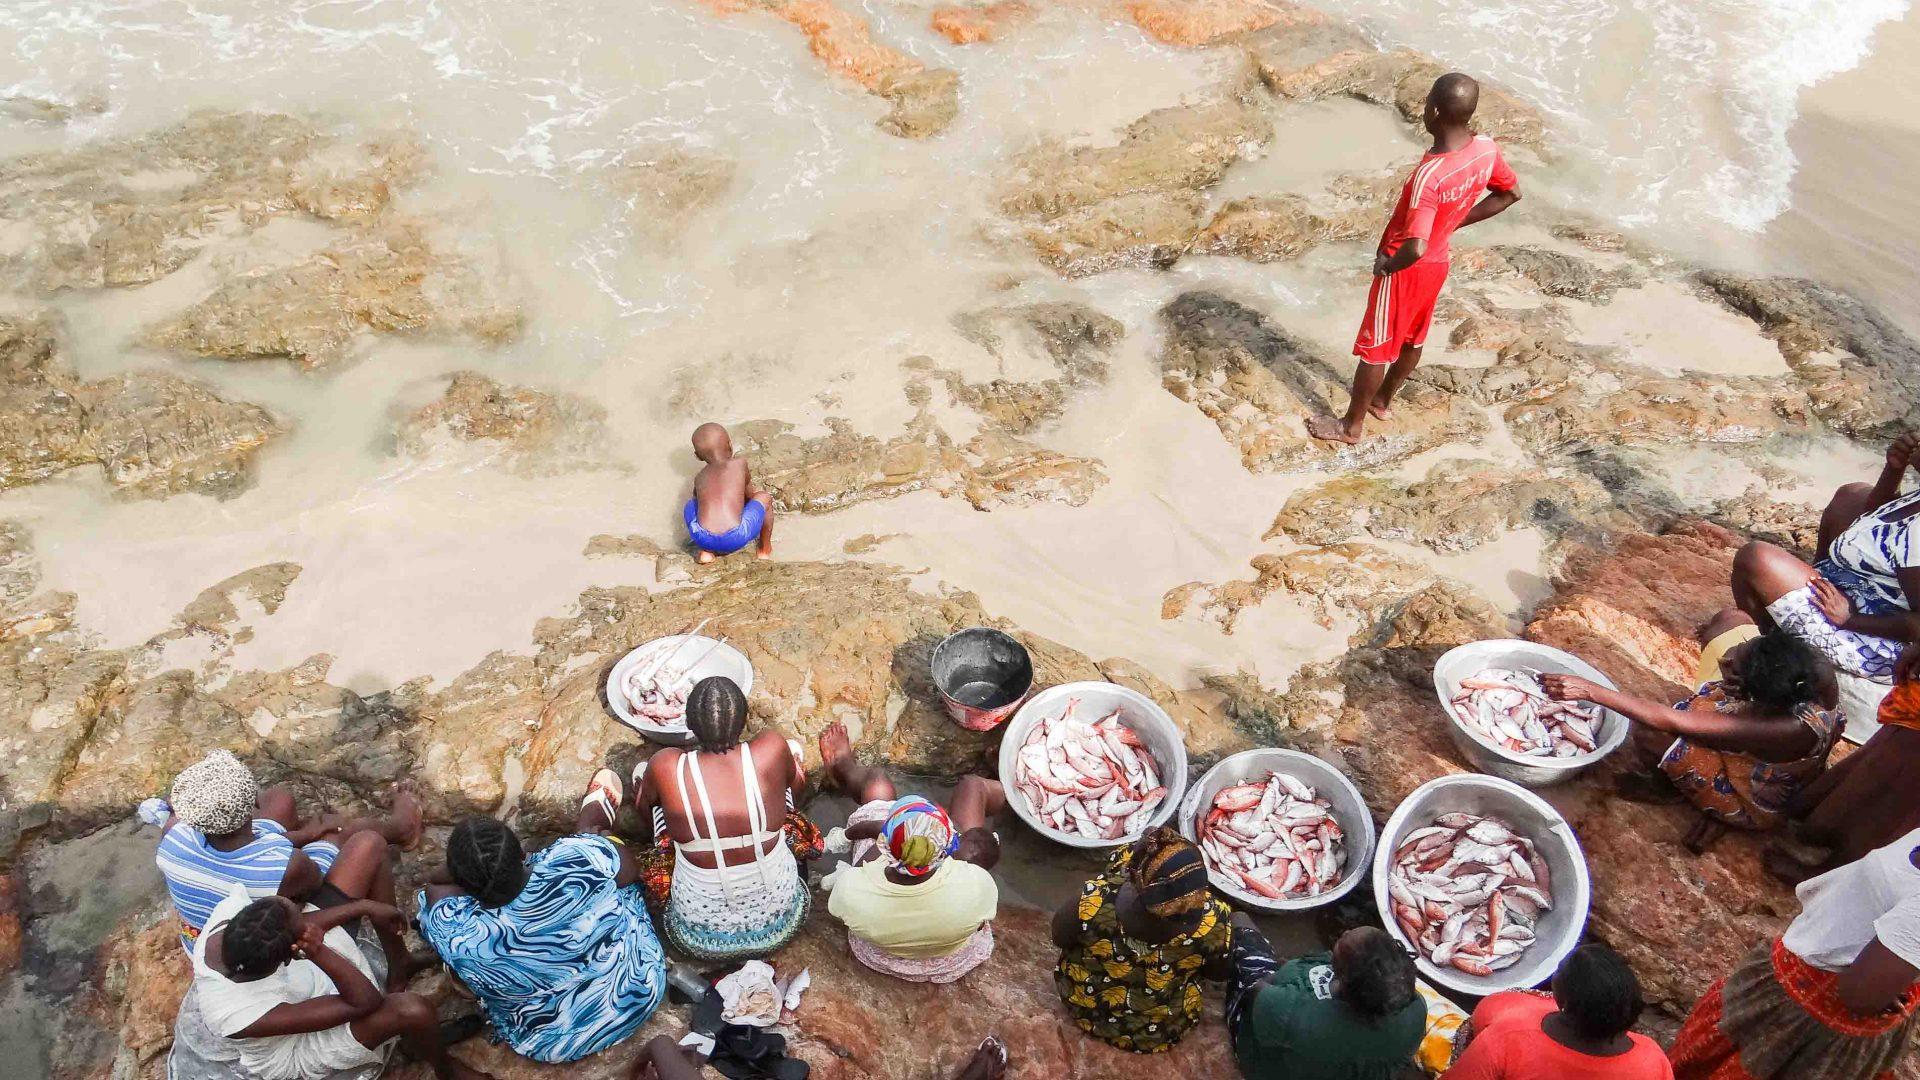 Fish dealers on the beach in Ghana.